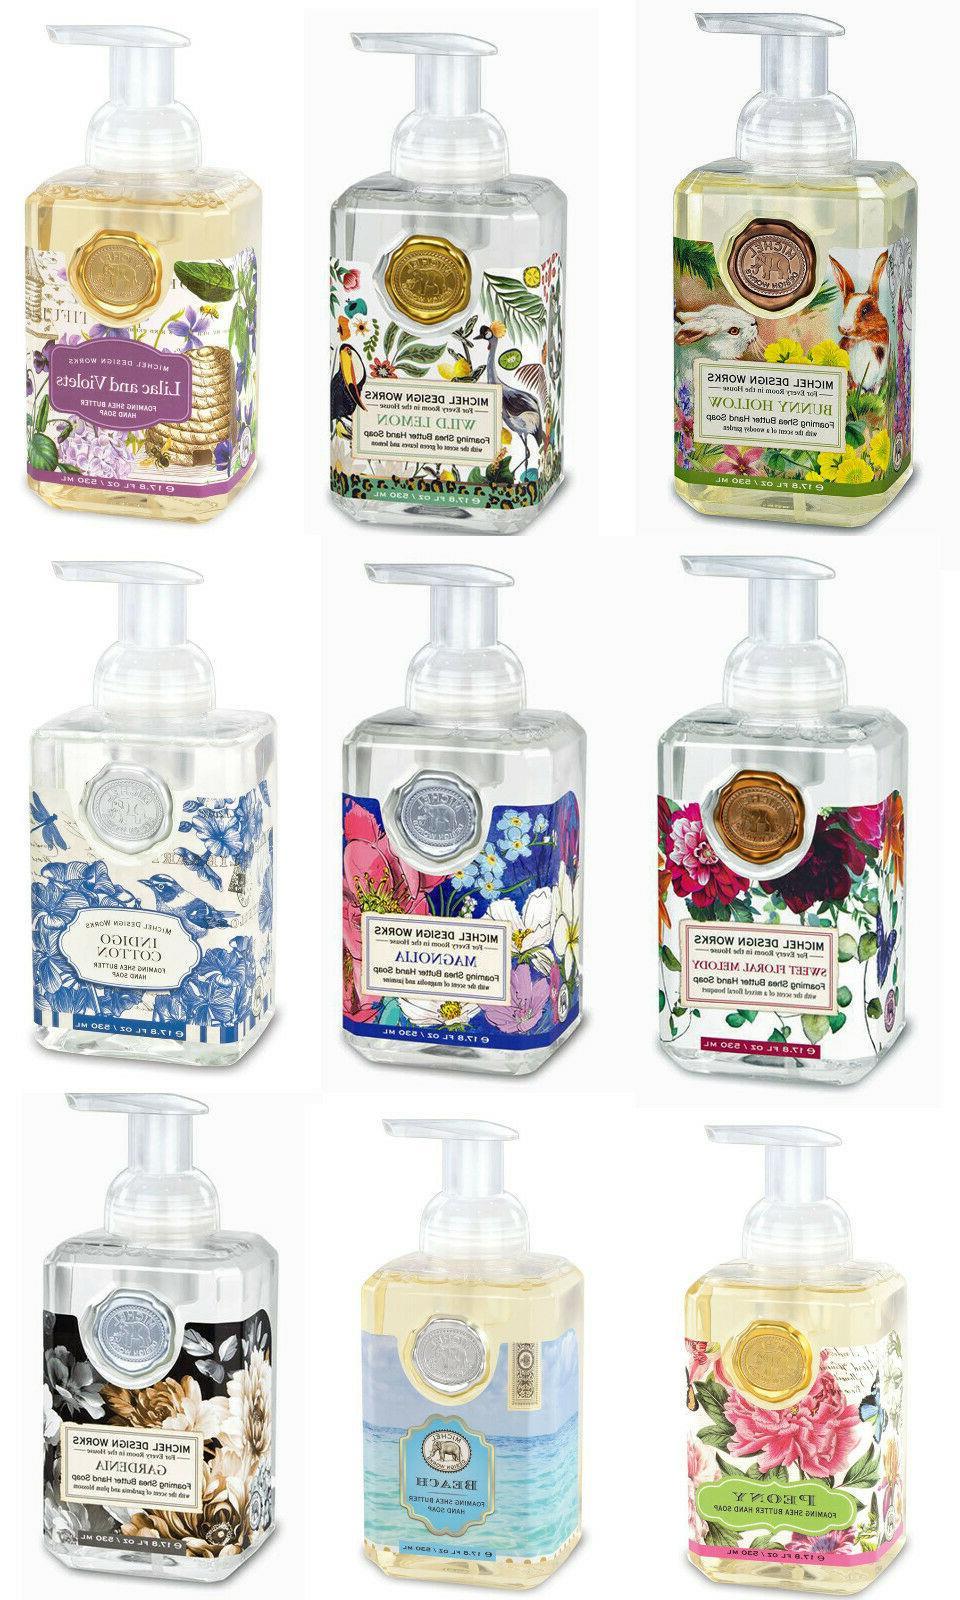 foaming hand soap 17 8 fl oz